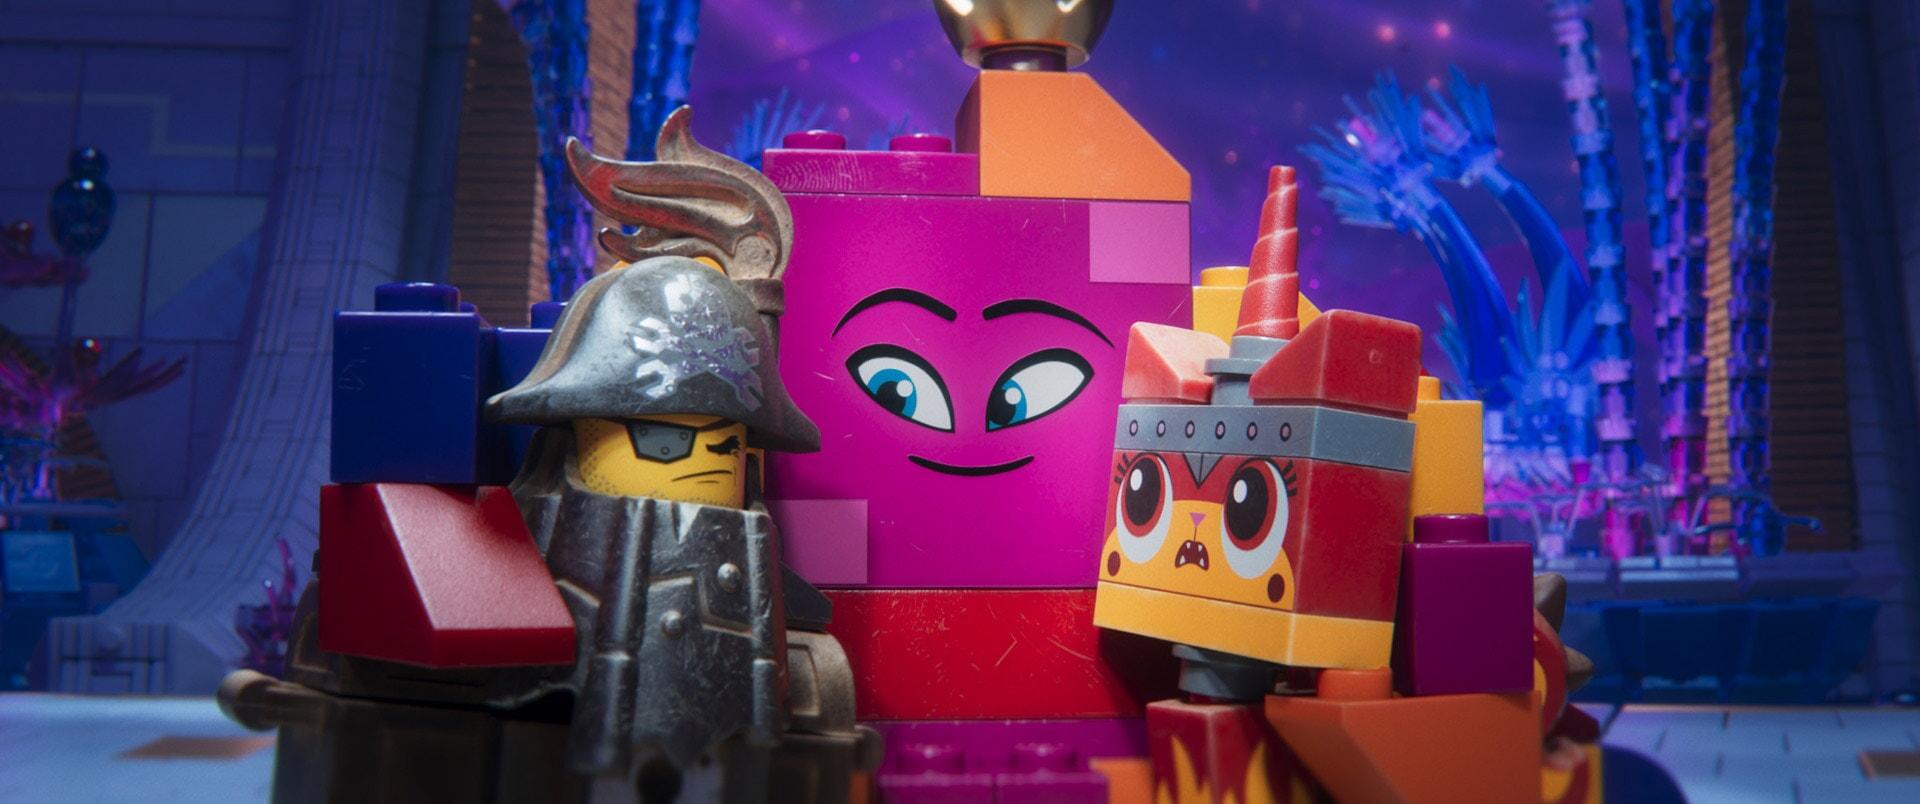 (L-R) MetalBeard (NICK OFFERMAN), Queen Watevra Wa'Nabi (TIFFANY HADDISH) and Ultrakatty (ALISON BRIE)